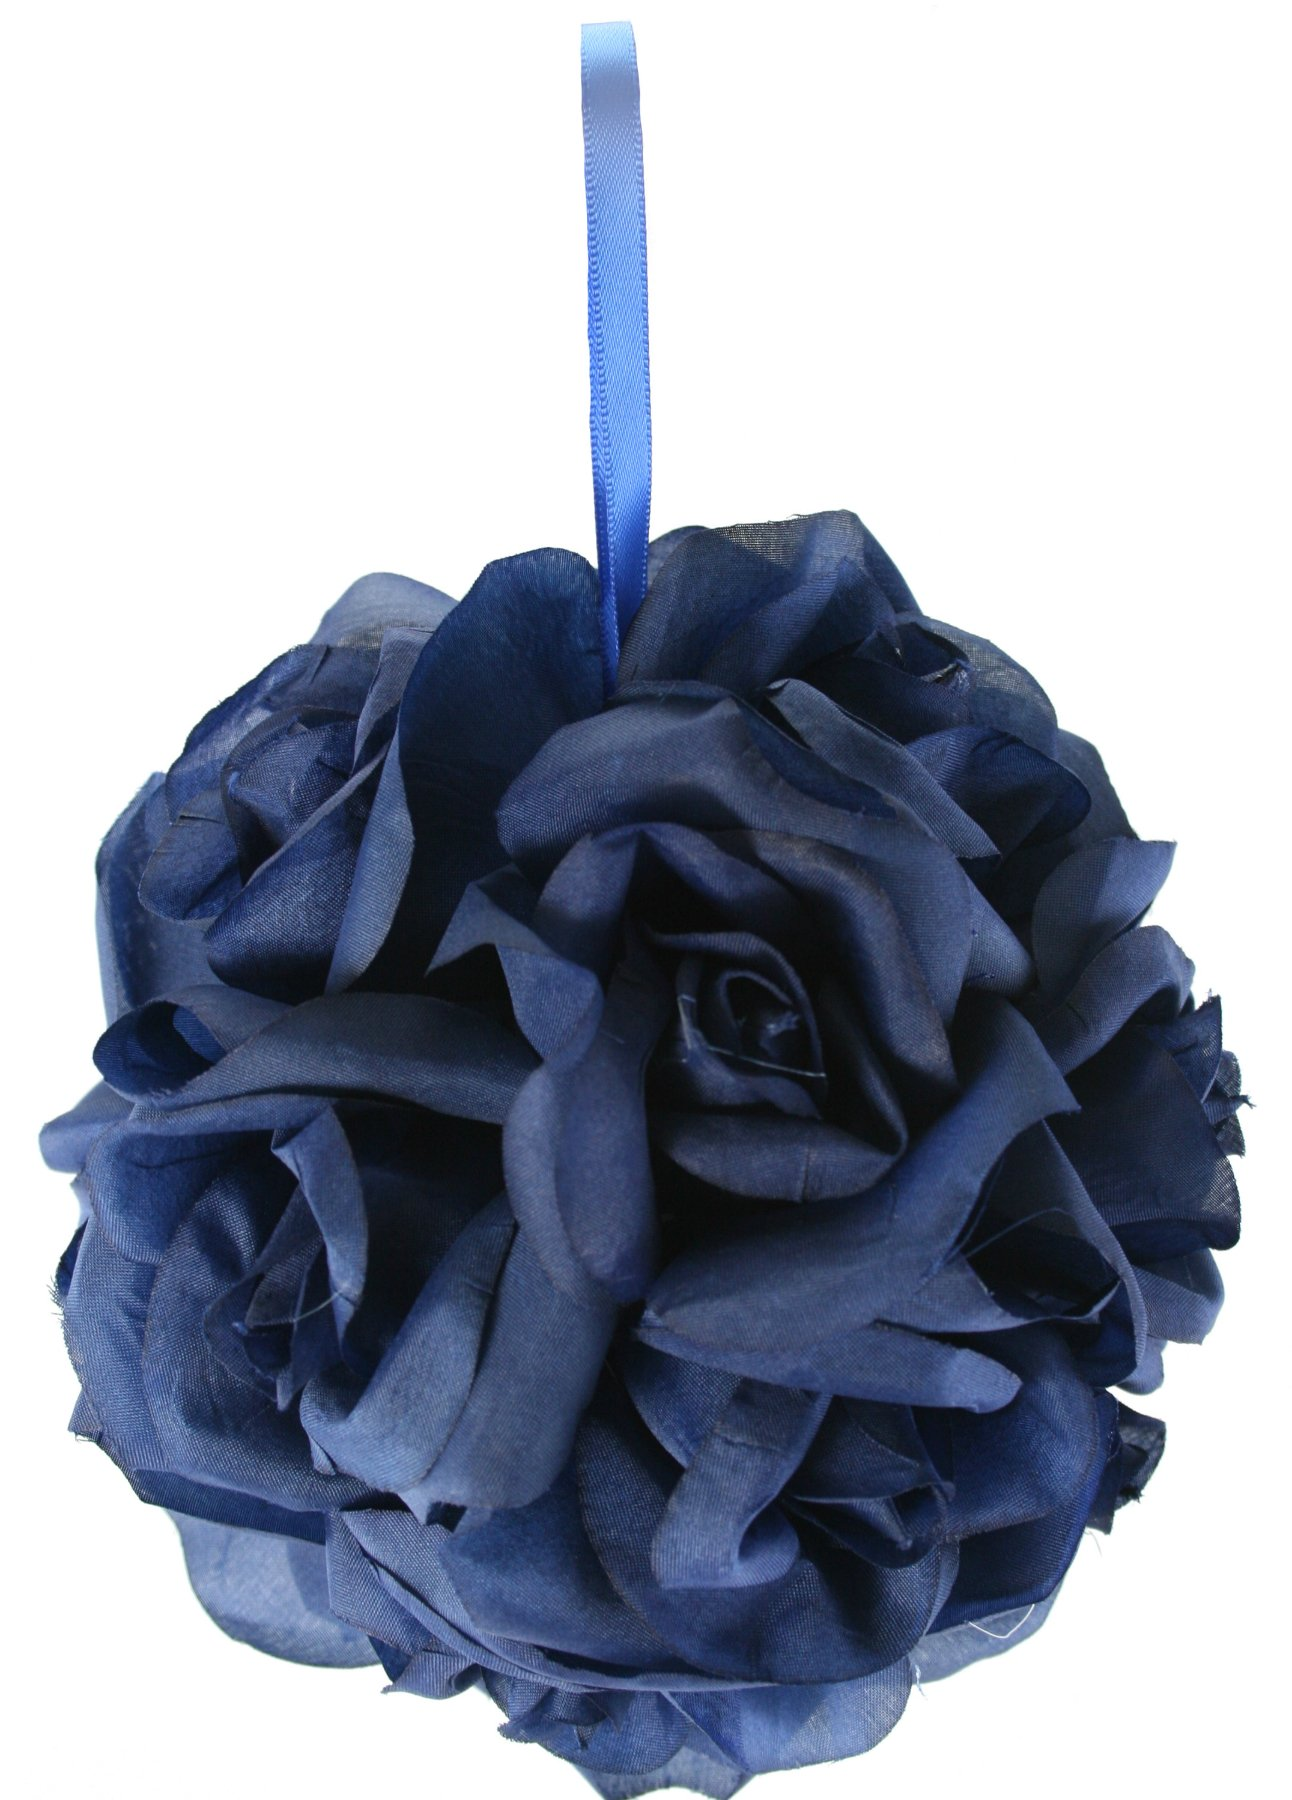 Garden-Rose-Kissing-Ball-Navy-Blue-6-inch-Pomander